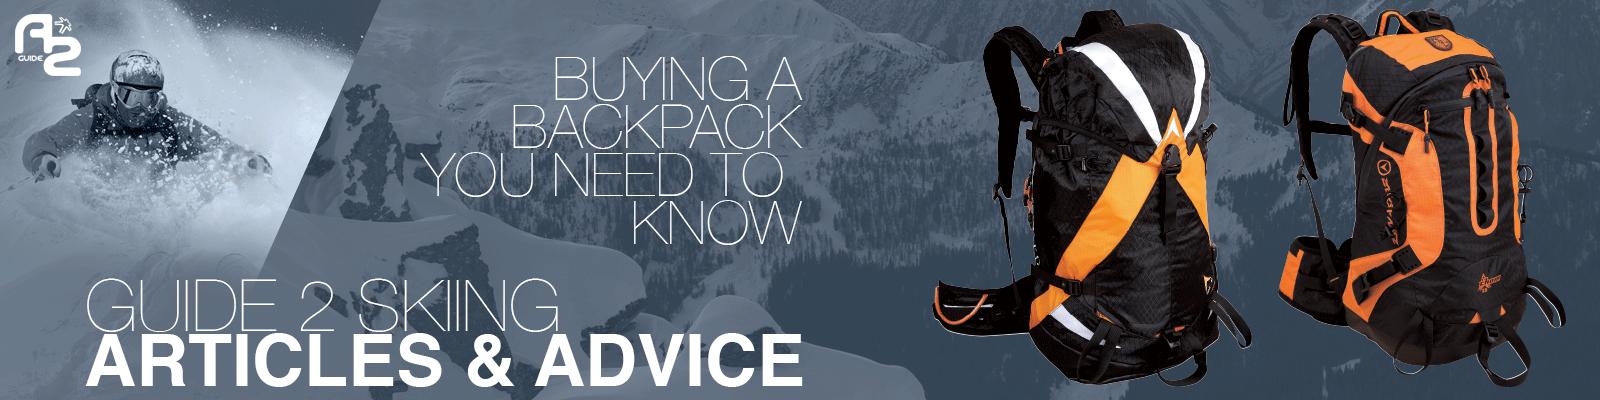 Guide 2 Skiing Salomon 24 HOURS PRO